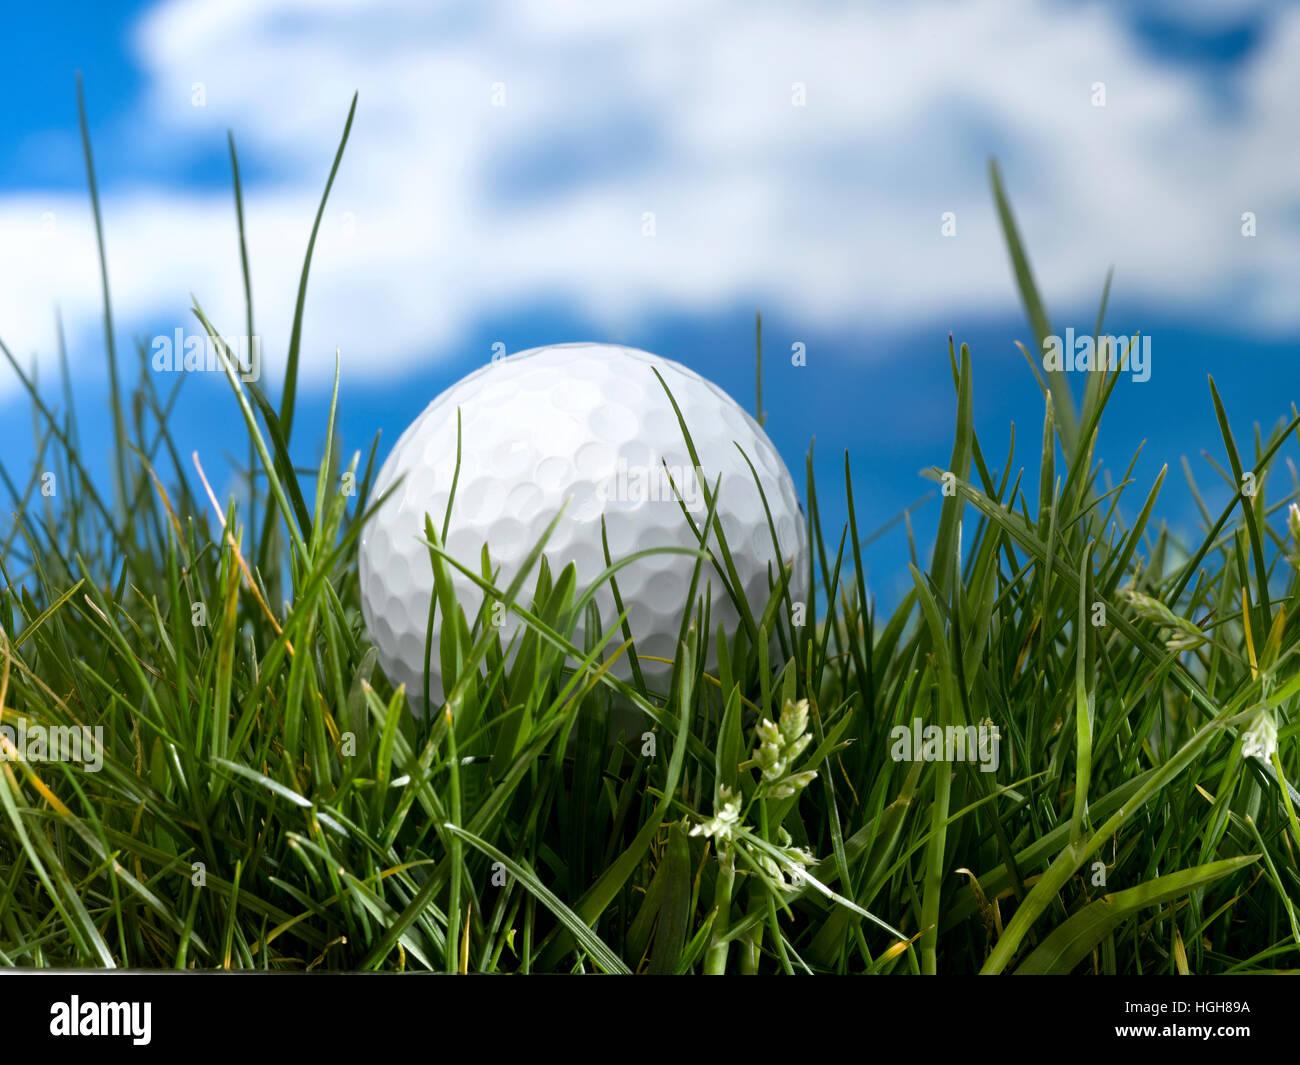 Golf Ball in long grass - Stock Image